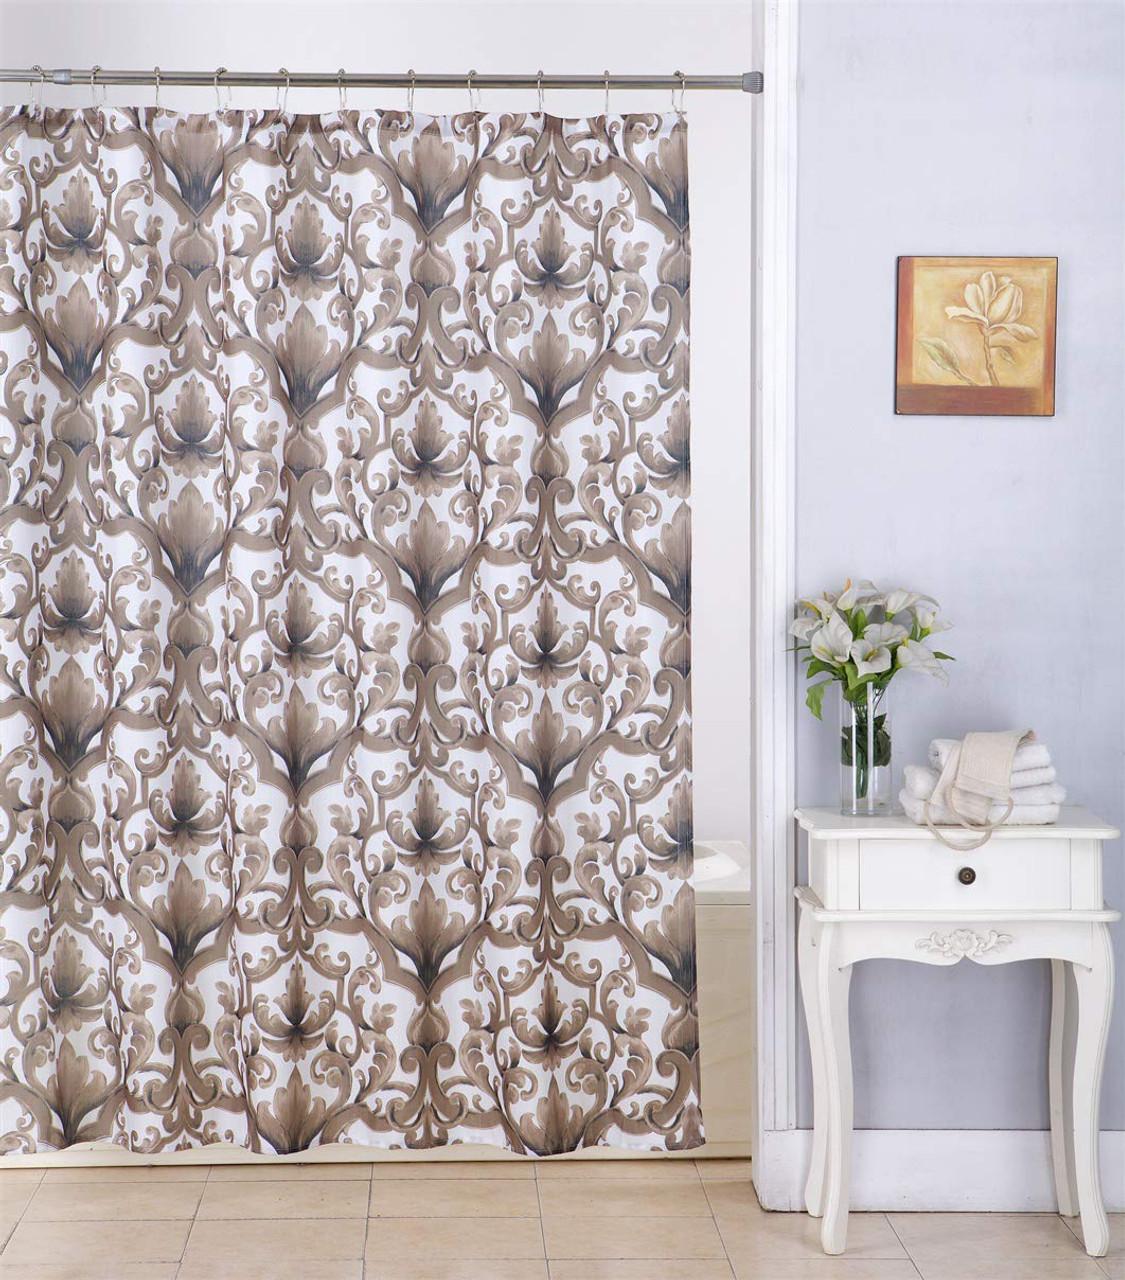 Kashi Home Ariel 70x70 Inch Canvas Fabric Shower Curtain Scroll Damask Print Chocolate